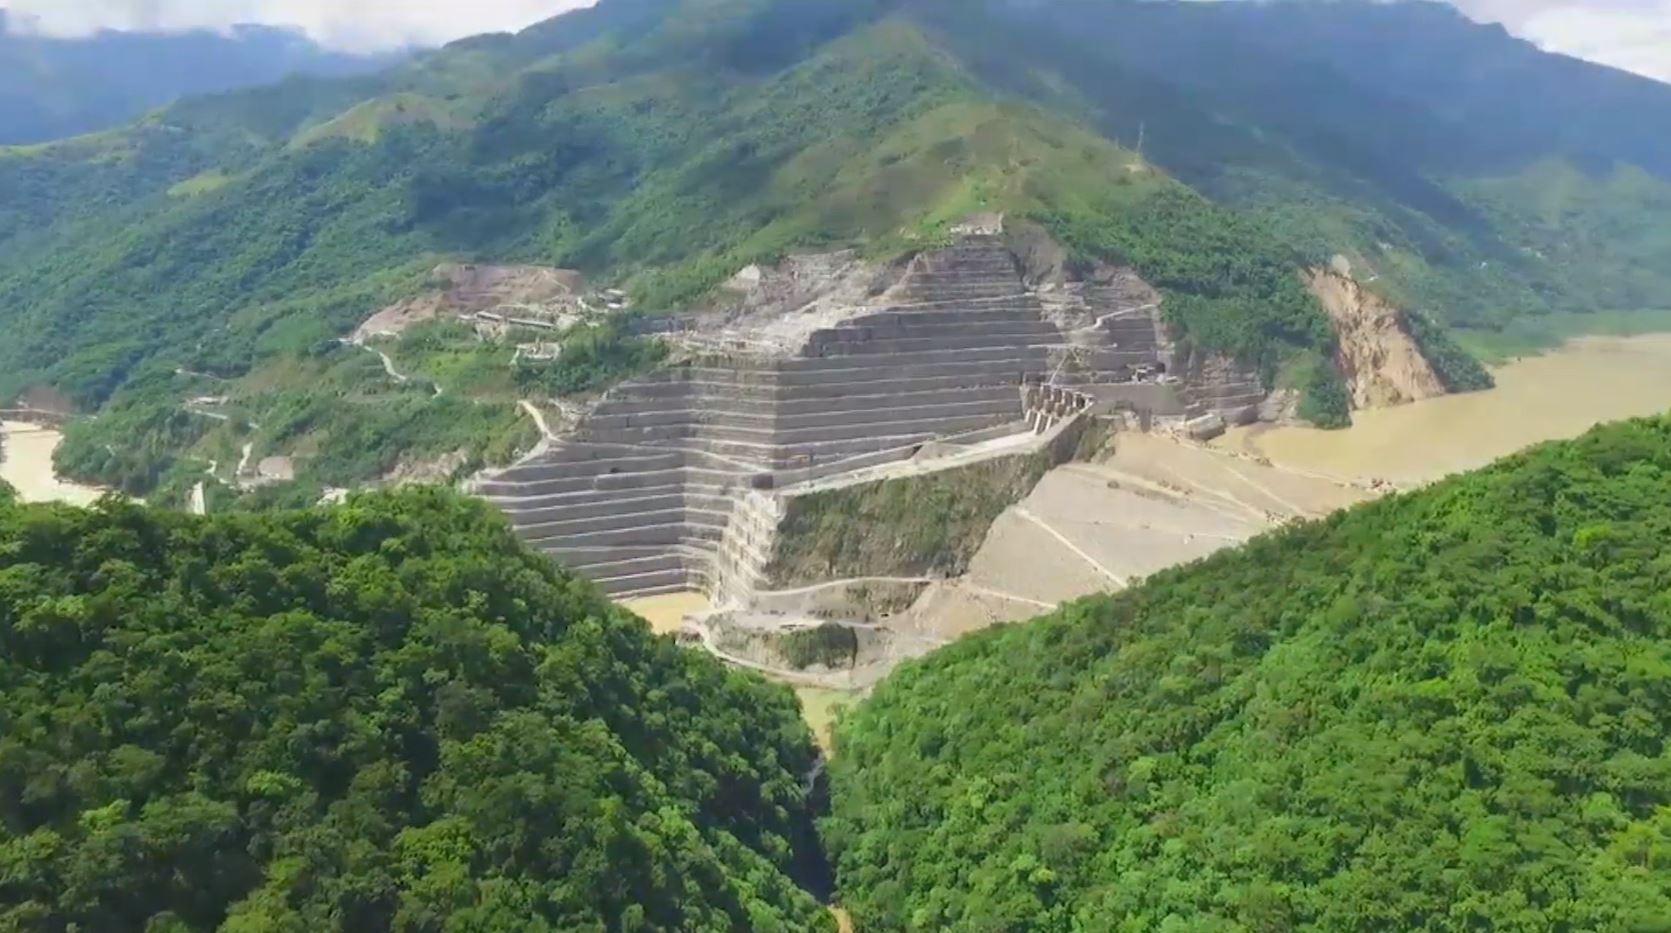 EPM recibió el primer pago de Mapfre por la cobertura de la contingencia de Hidroituango